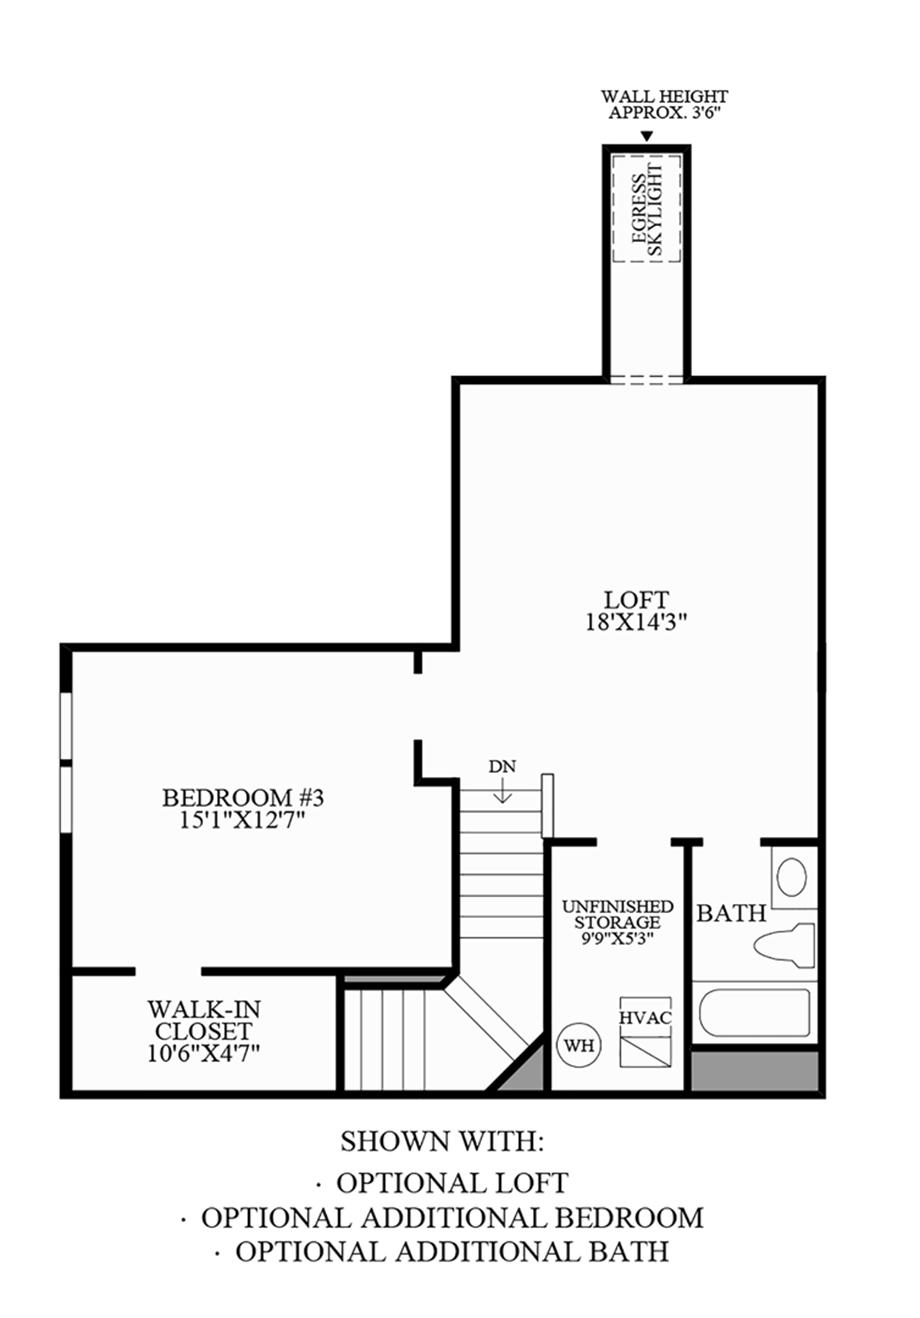 Optional Loft & Additional Bedroom/Bath Floor Plan